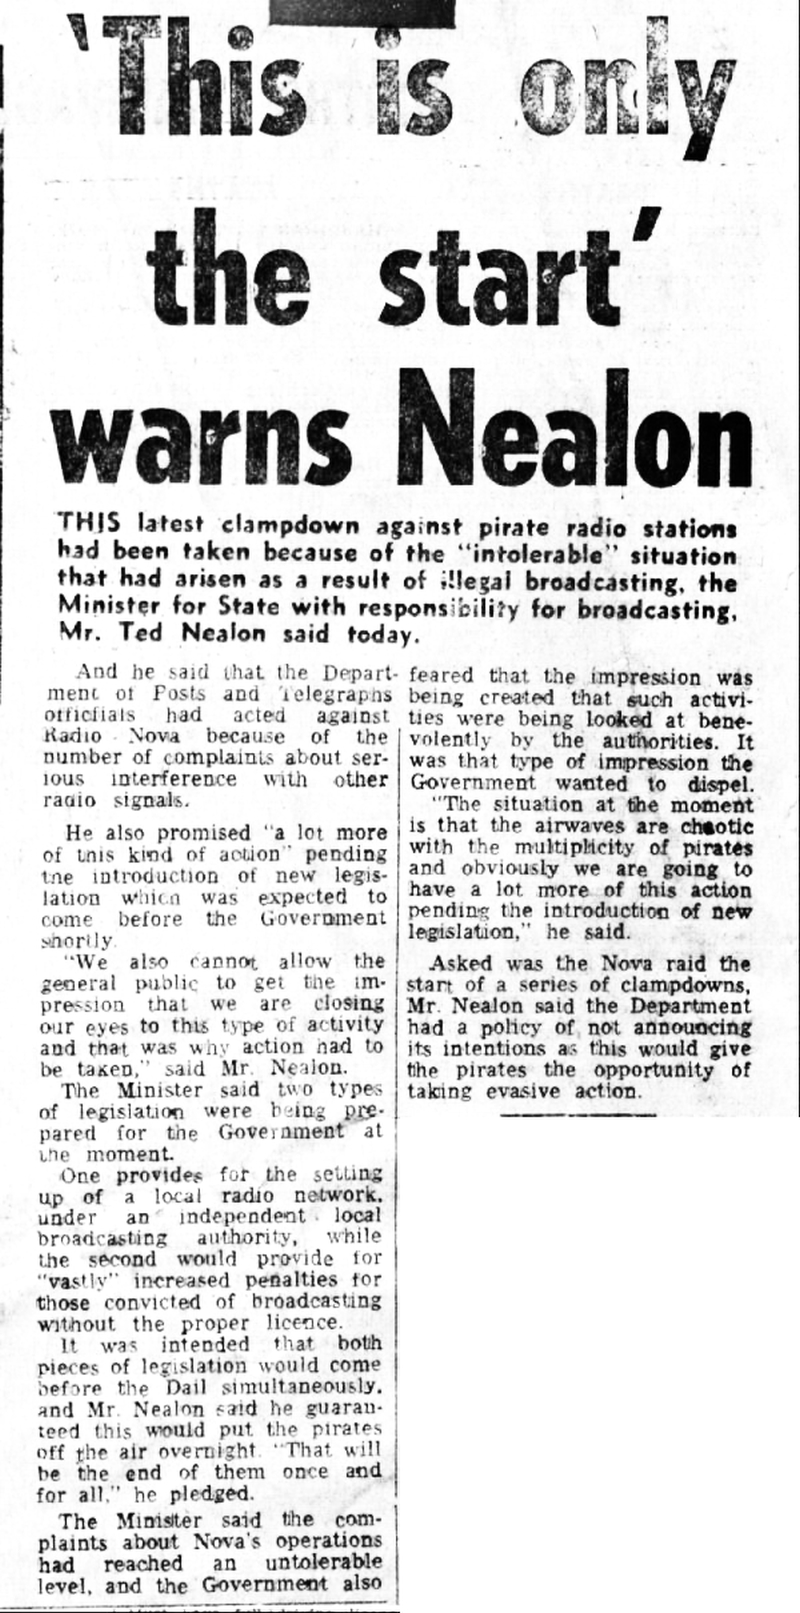 Radio nova raid - this is only the start warns Nealon